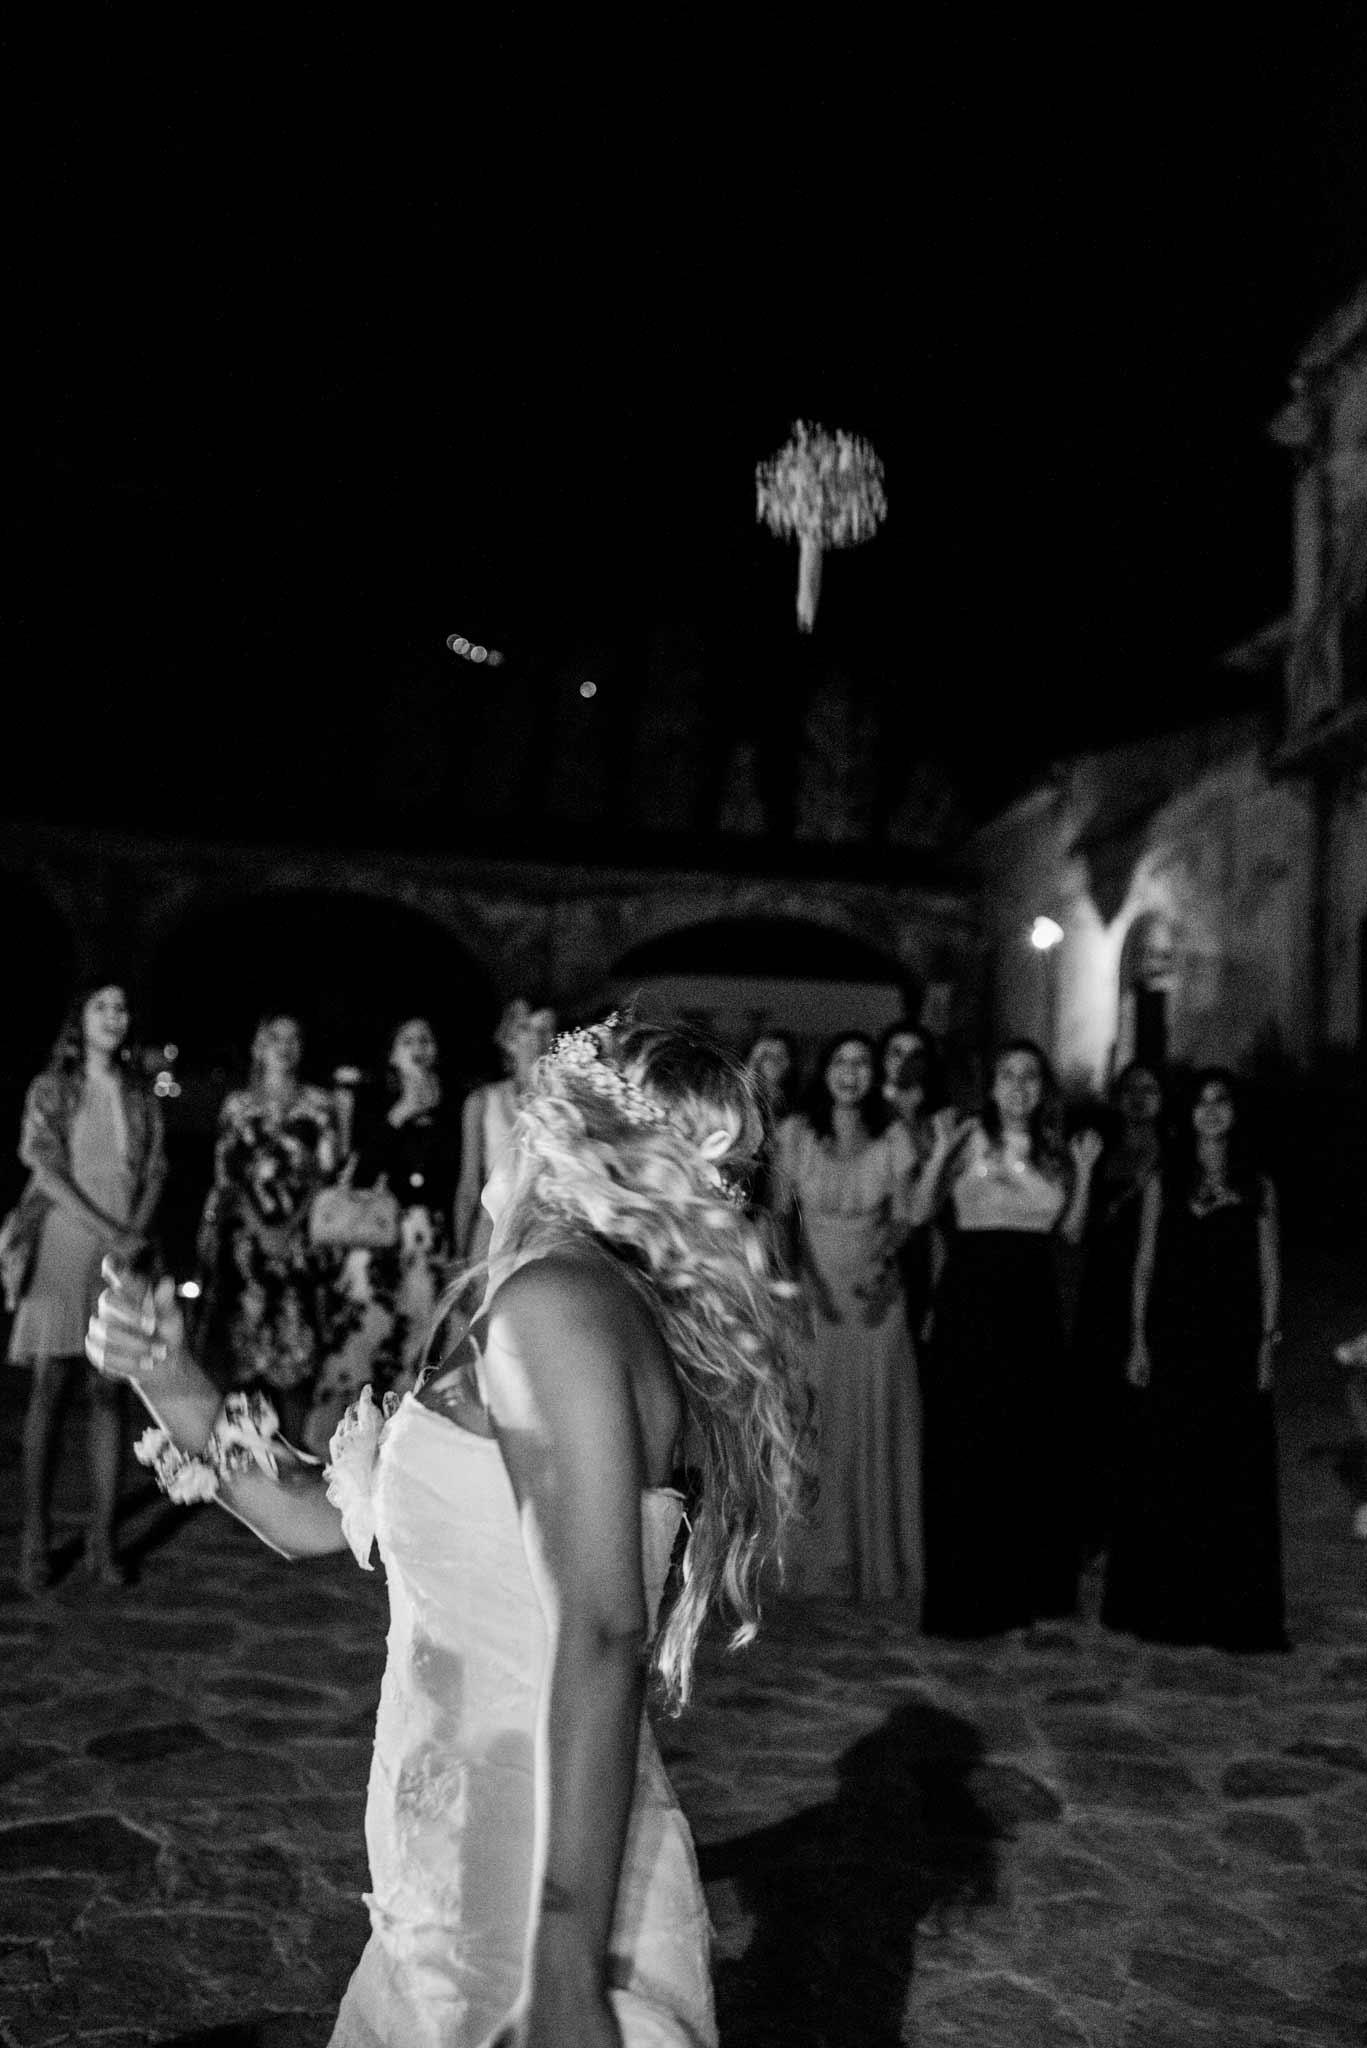 MY ADVISE IF PLANNING A WEDDING DURING CORONAVIRUS PANDEMIC